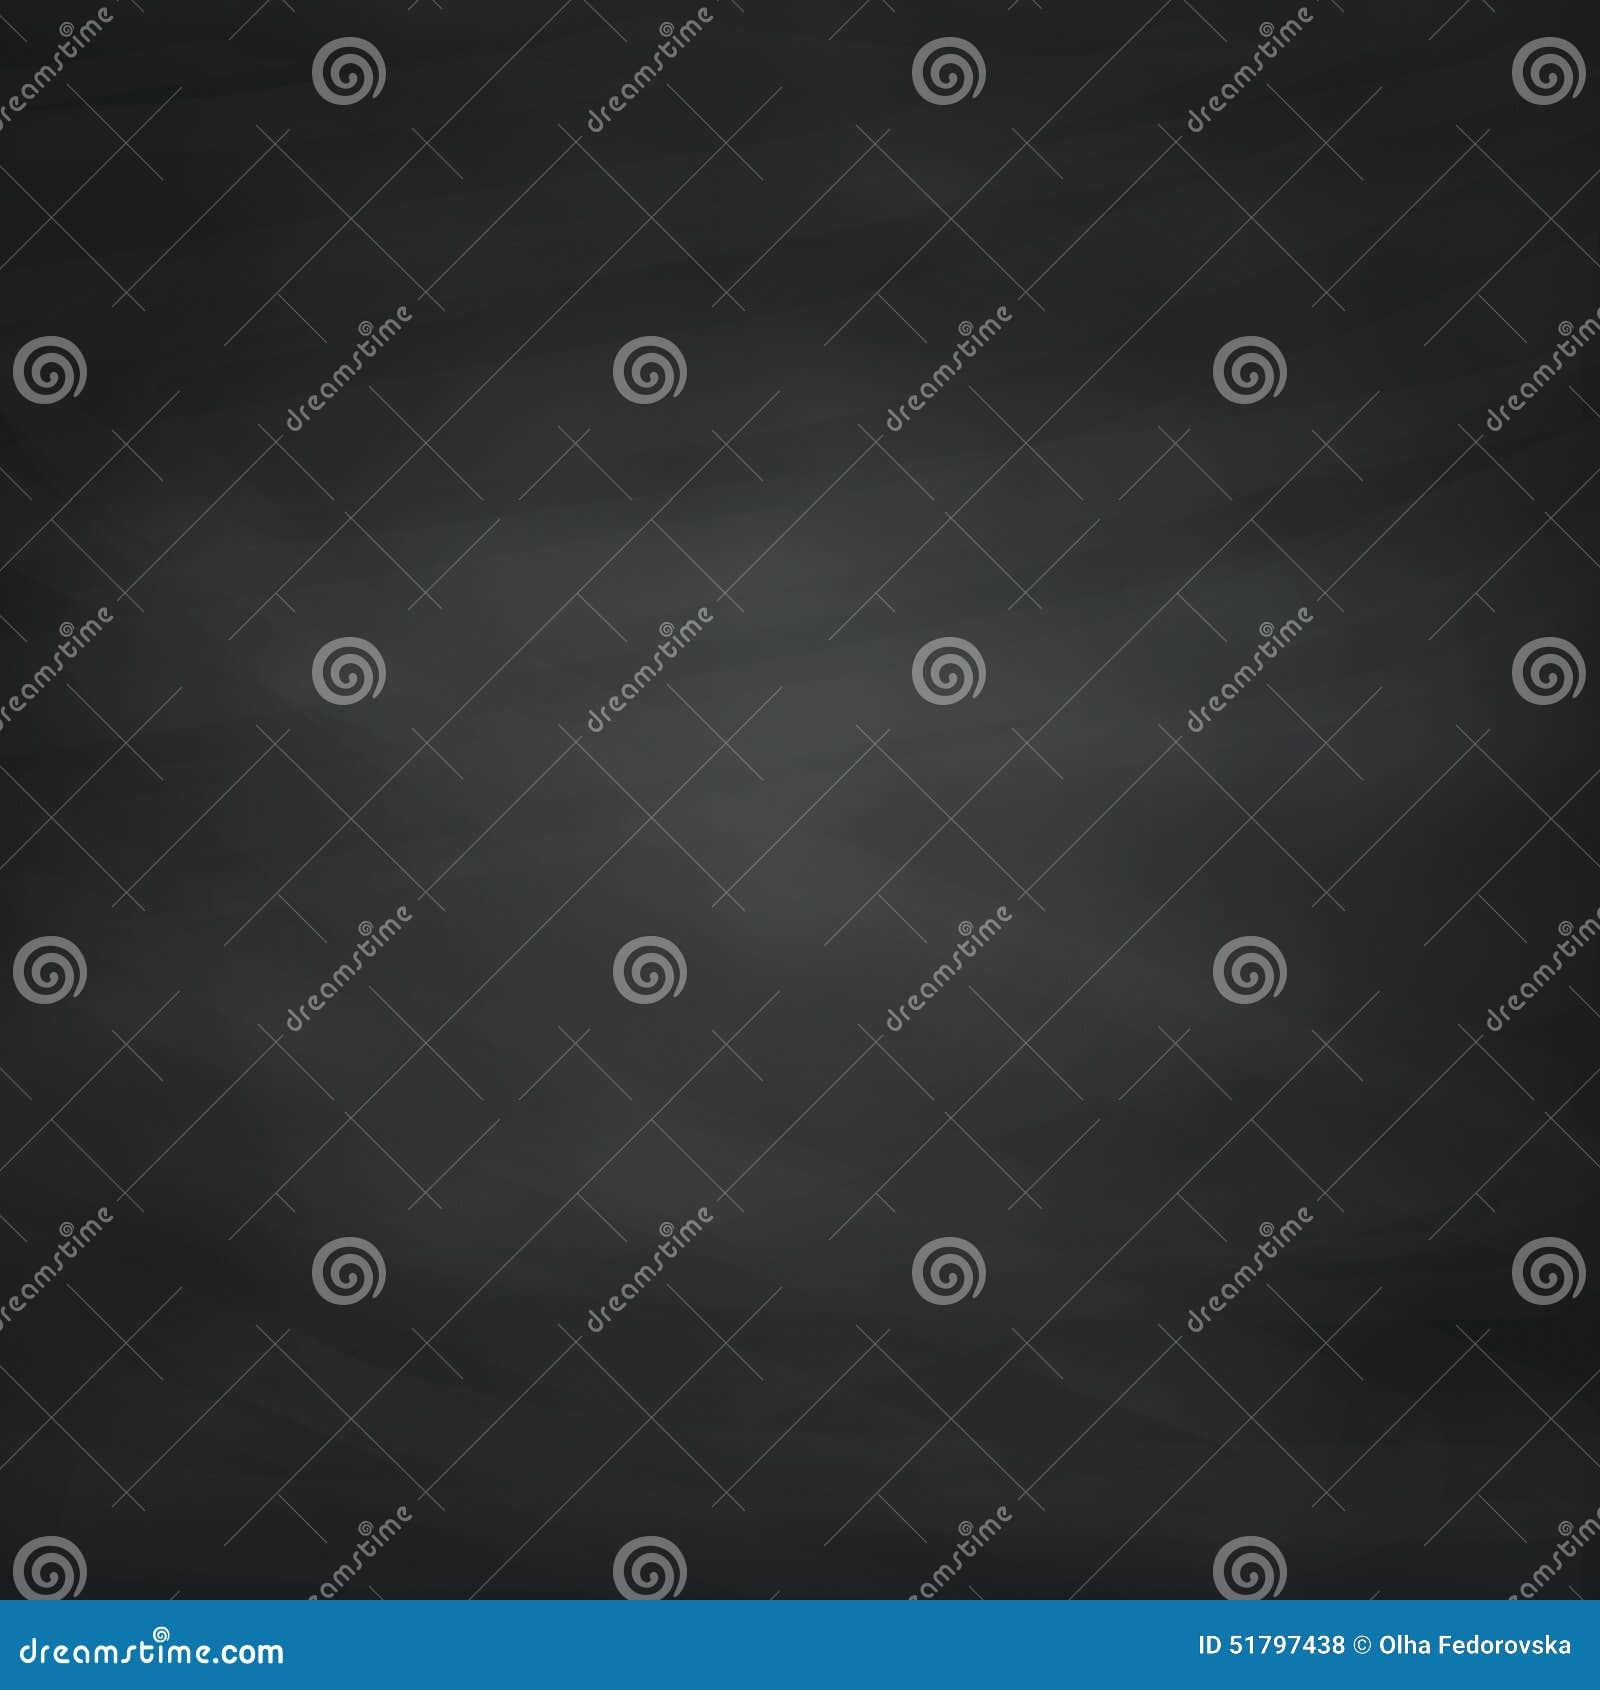 Black Chalkboard Texture. Vector Background.